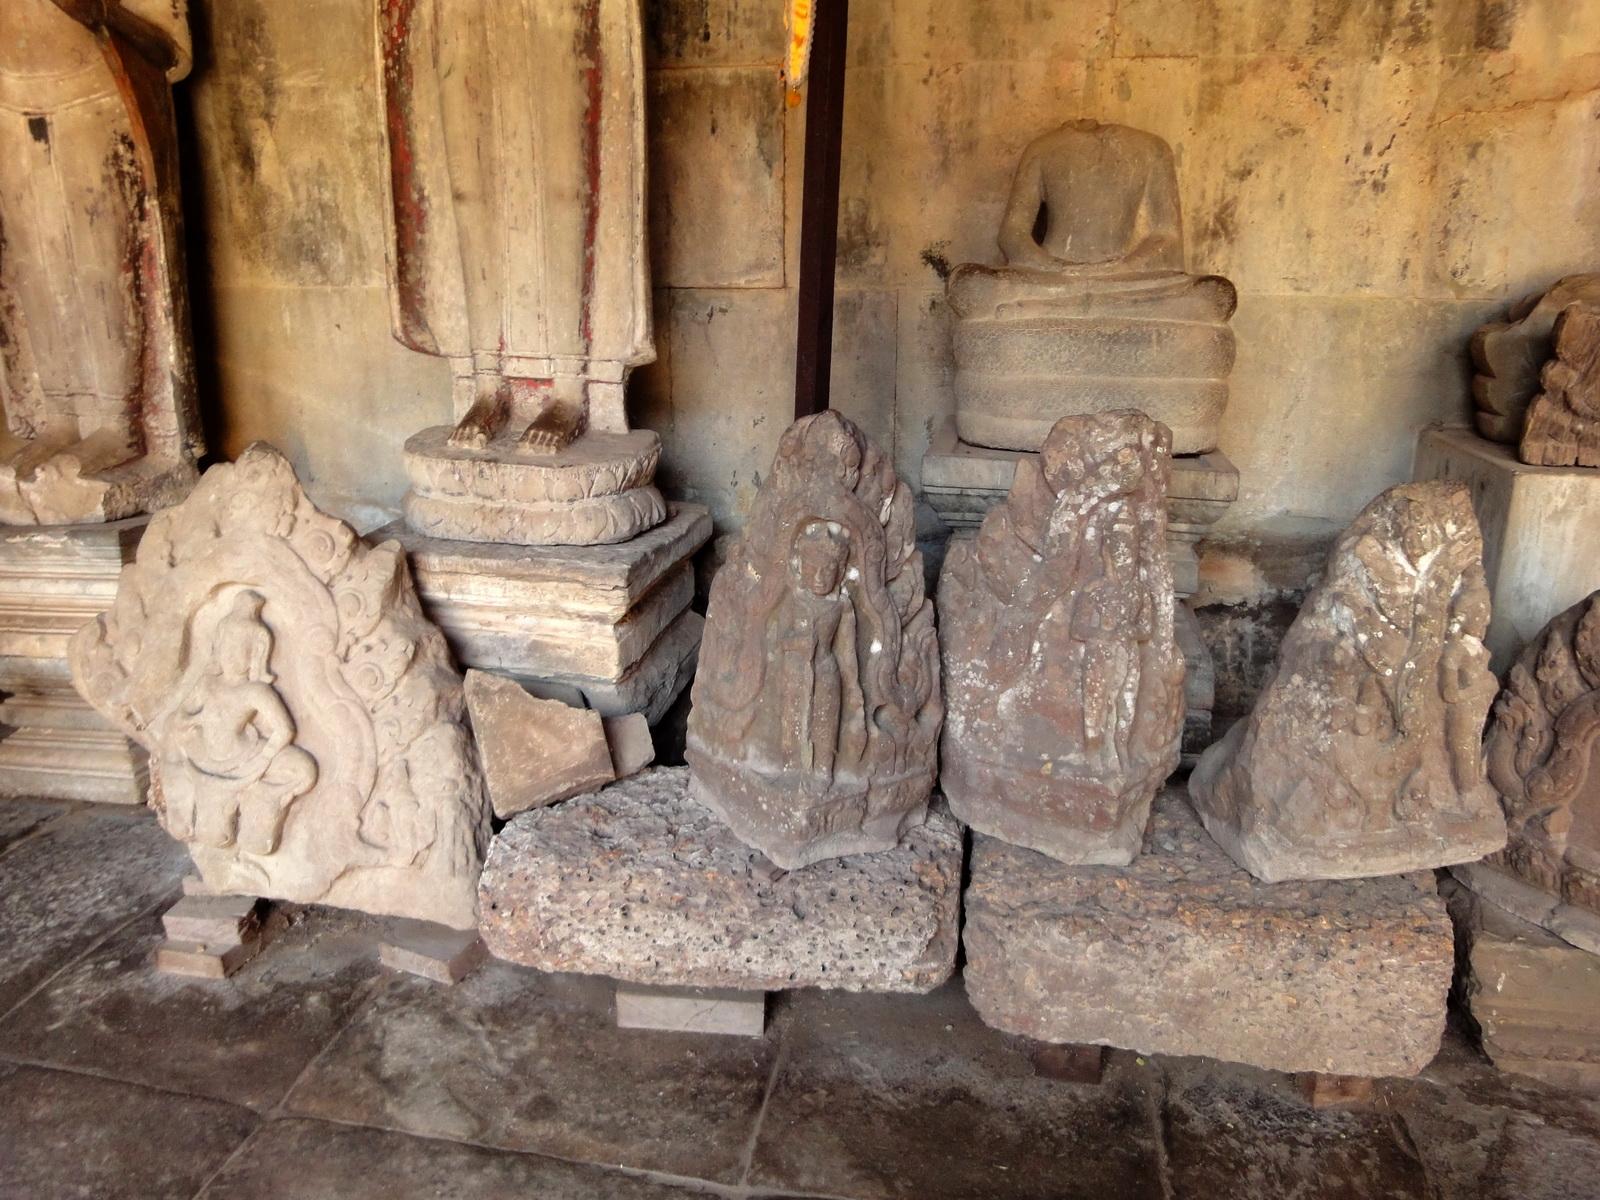 Angkor Wat inner sanctuary gallery Buddha relics 04